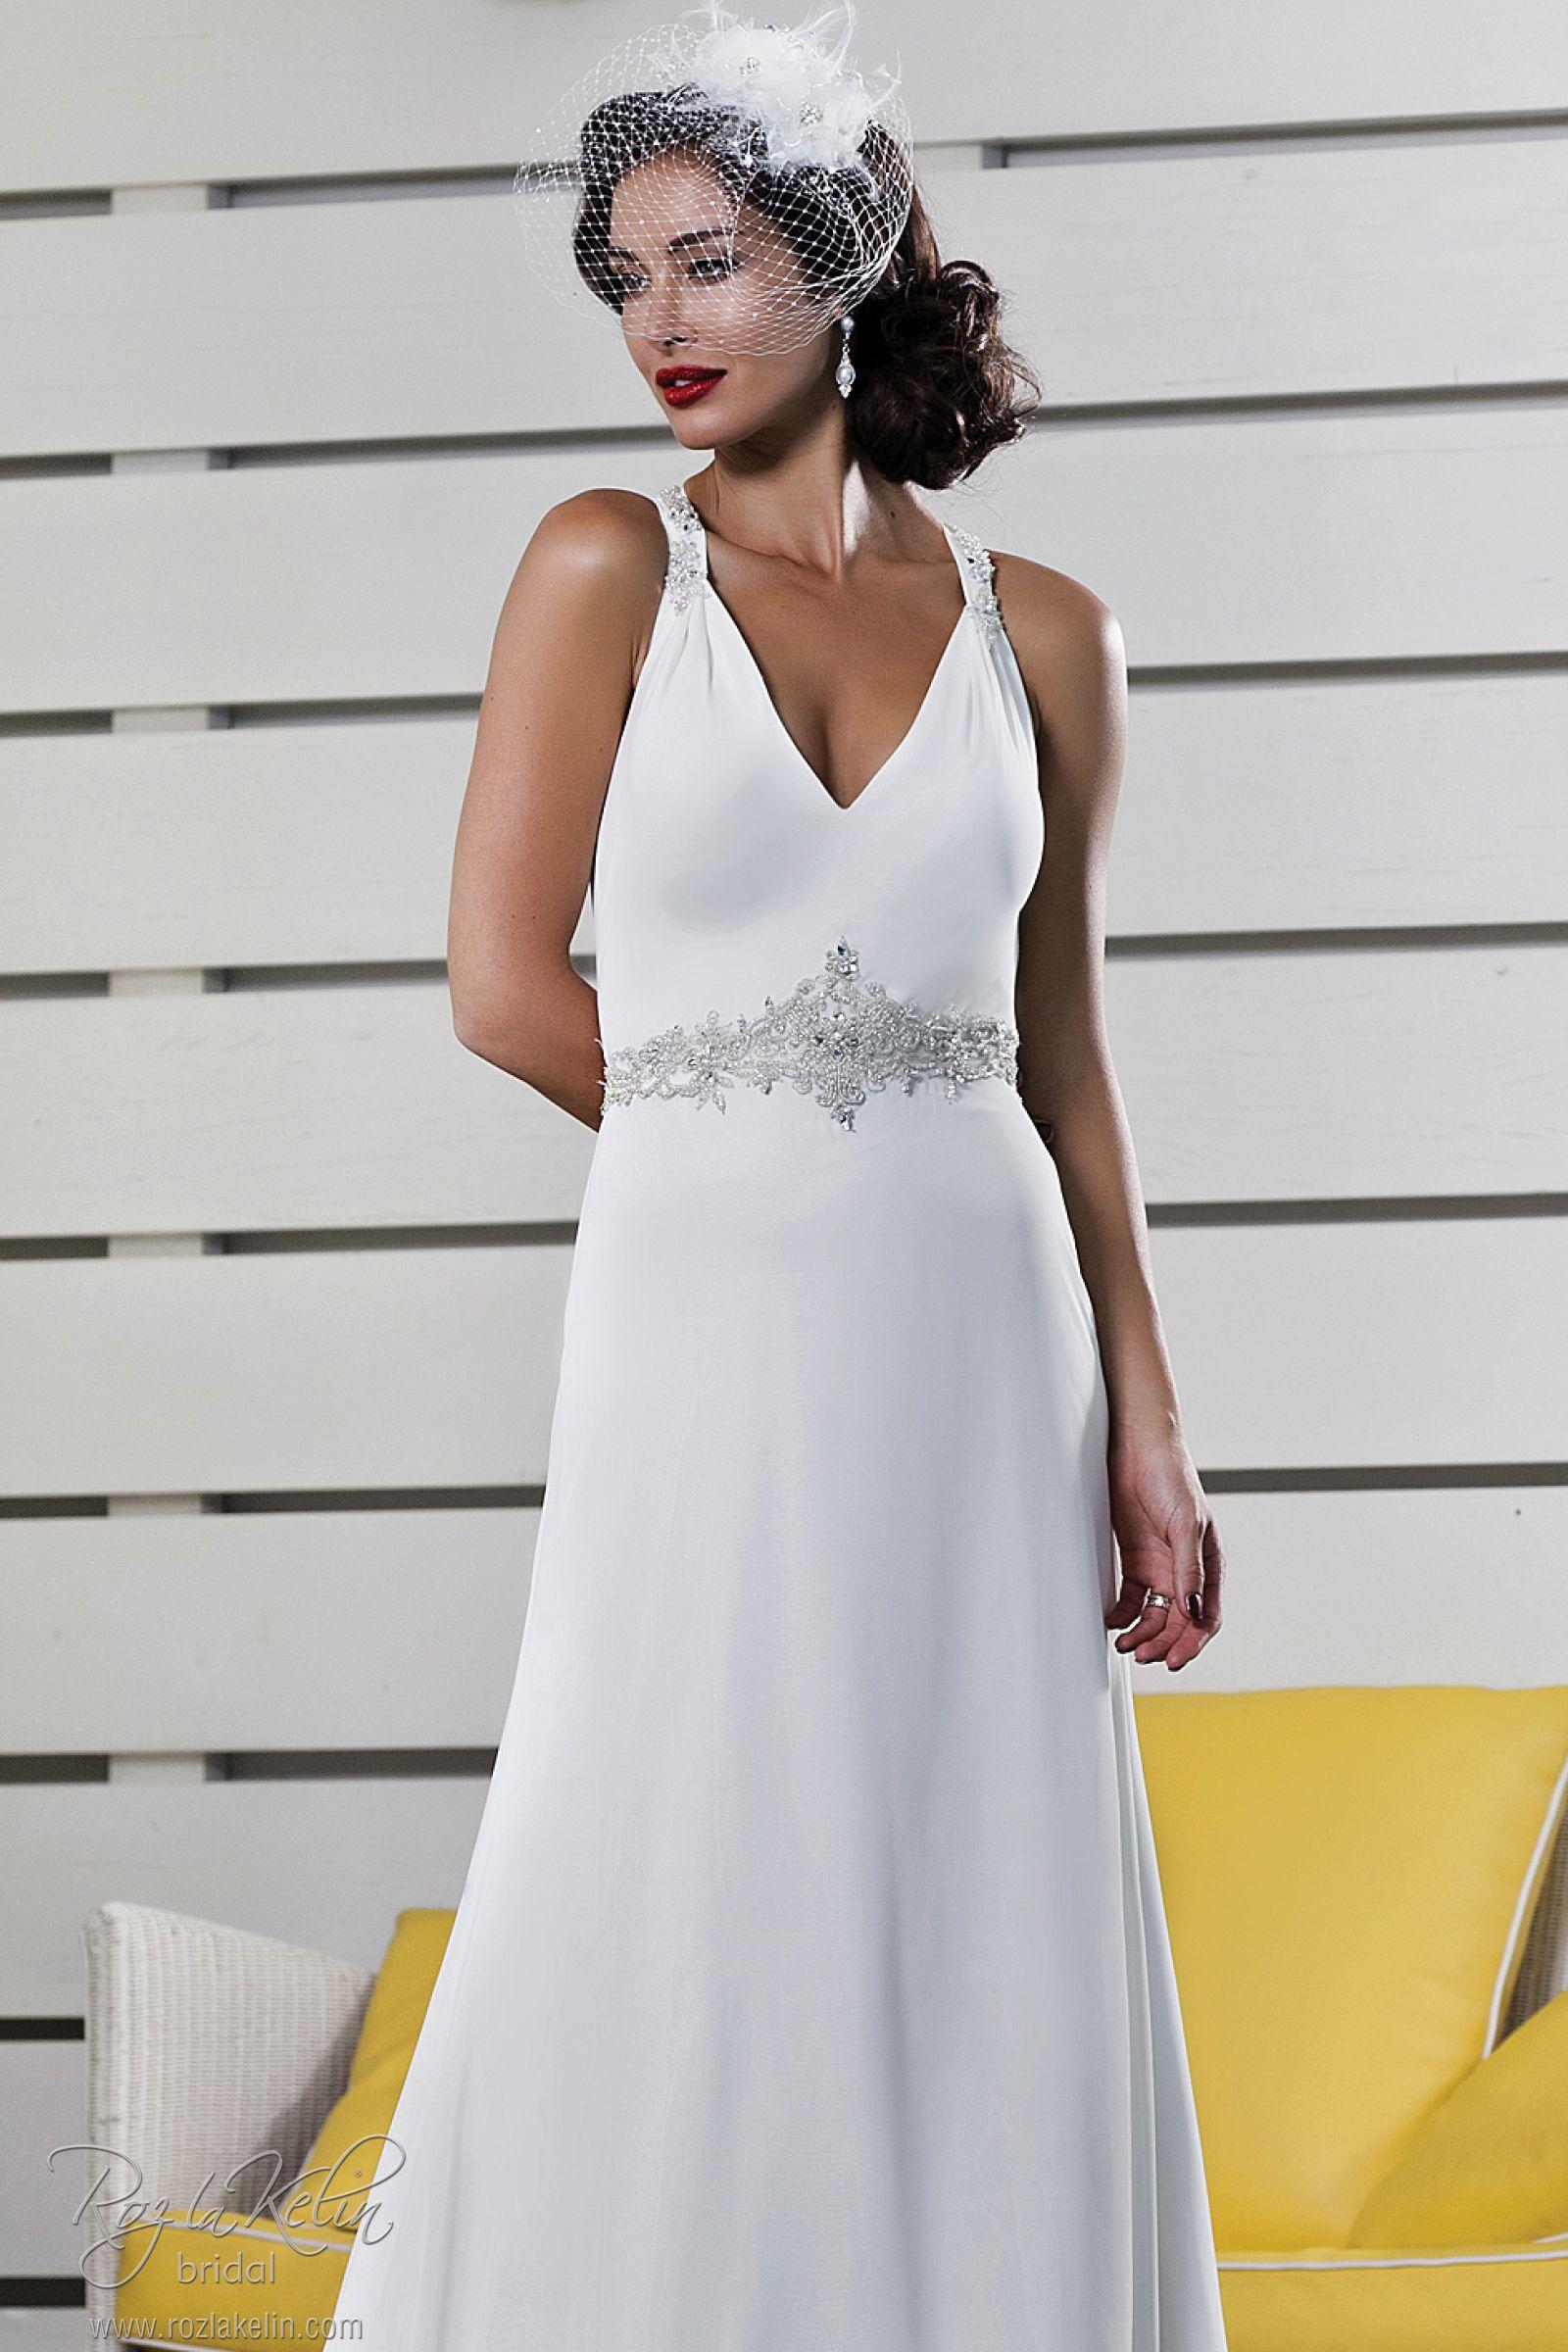 Roz La Kelin Bridal Cashmere 5465T Wedding Dress